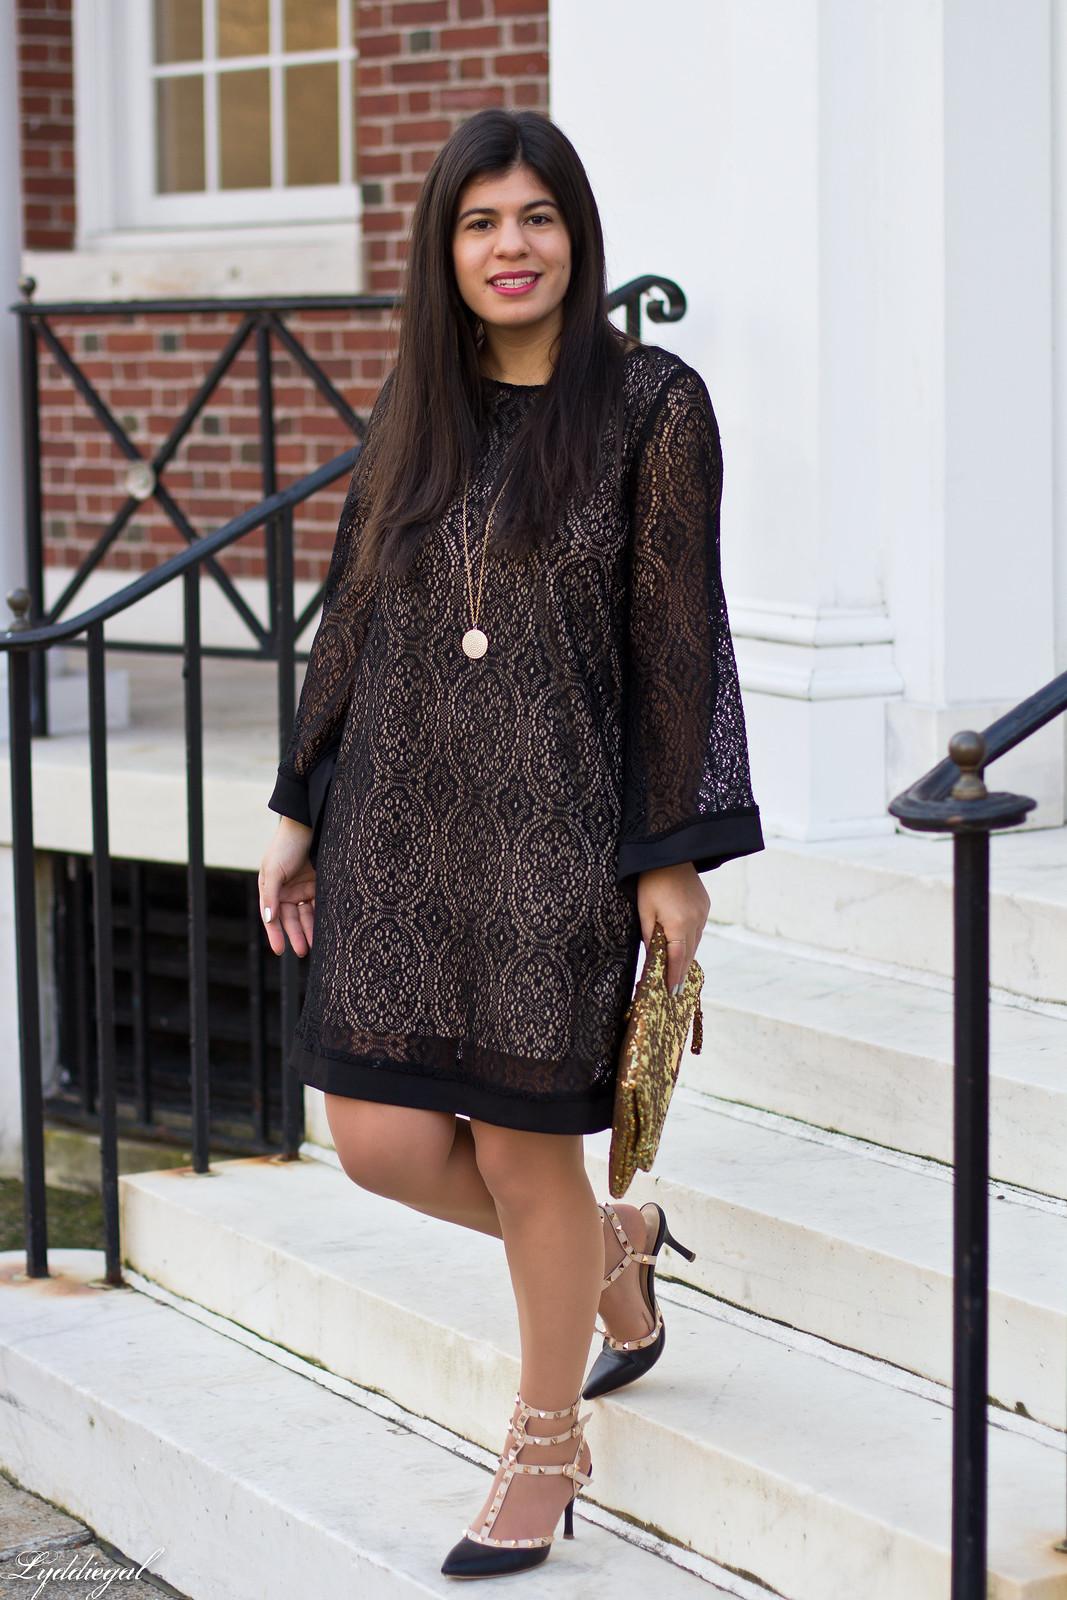 black lace dress, gold sequin clutch, studded pumps.jpg